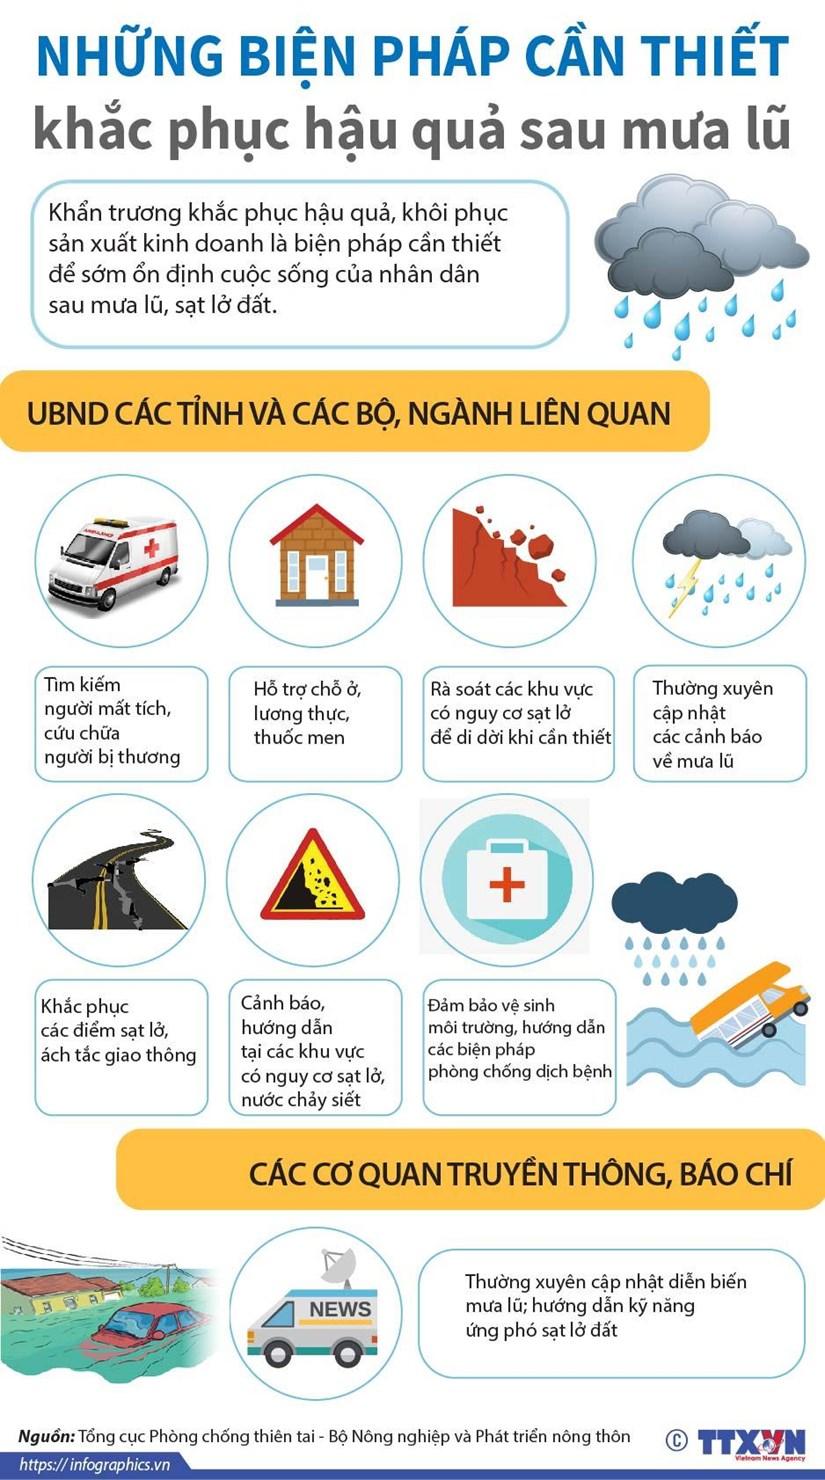 [Infographics] Nhung bien phap can thiet khac phuc hau qua sau mua lu hinh anh 1